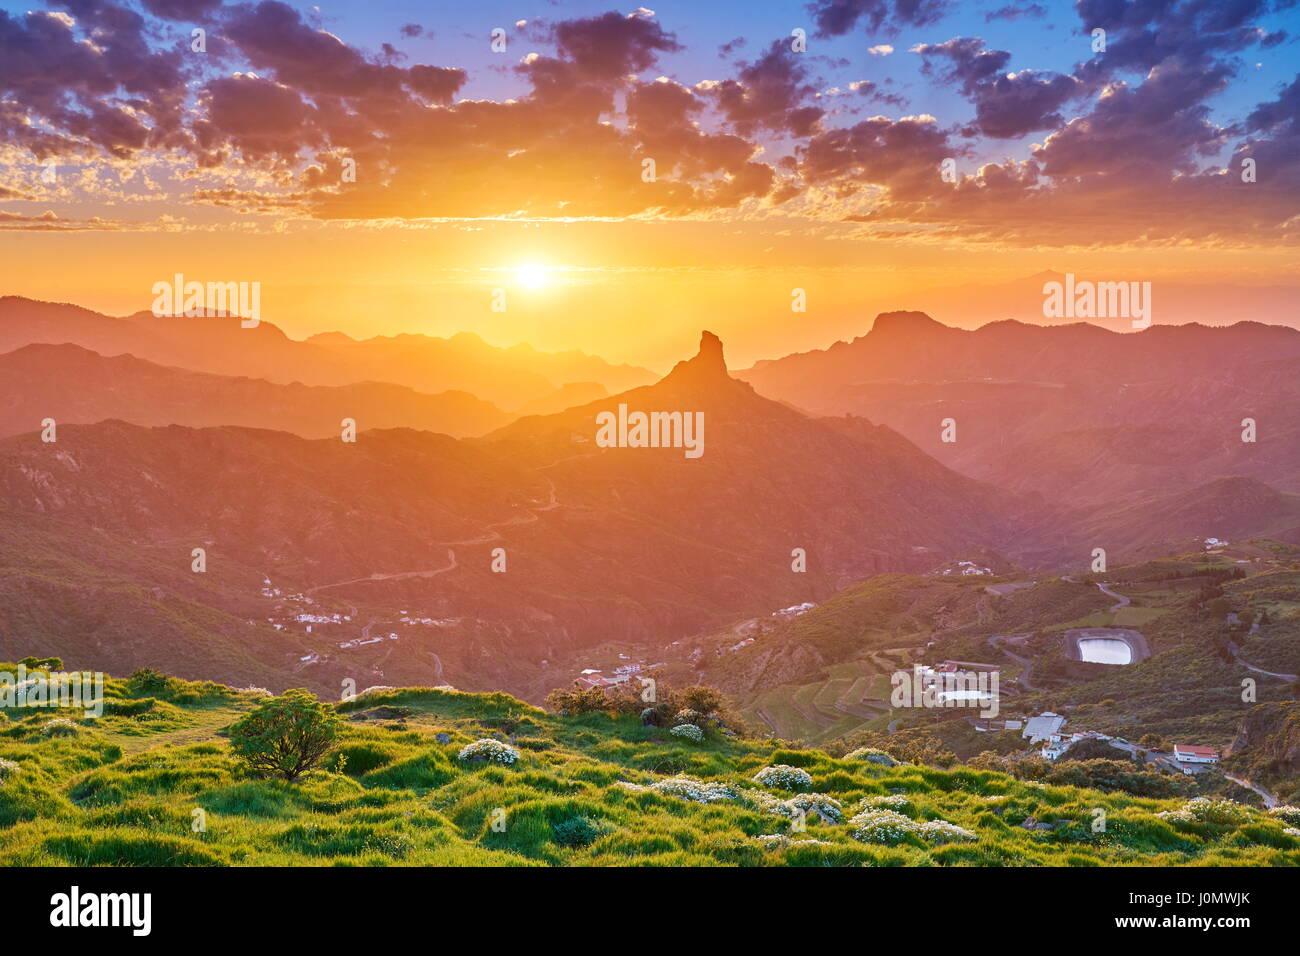 Sonnenuntergang Berglandschaft am Roque Bentayga, Gran Canaria, Kanarische Inseln, Spanien Stockfoto